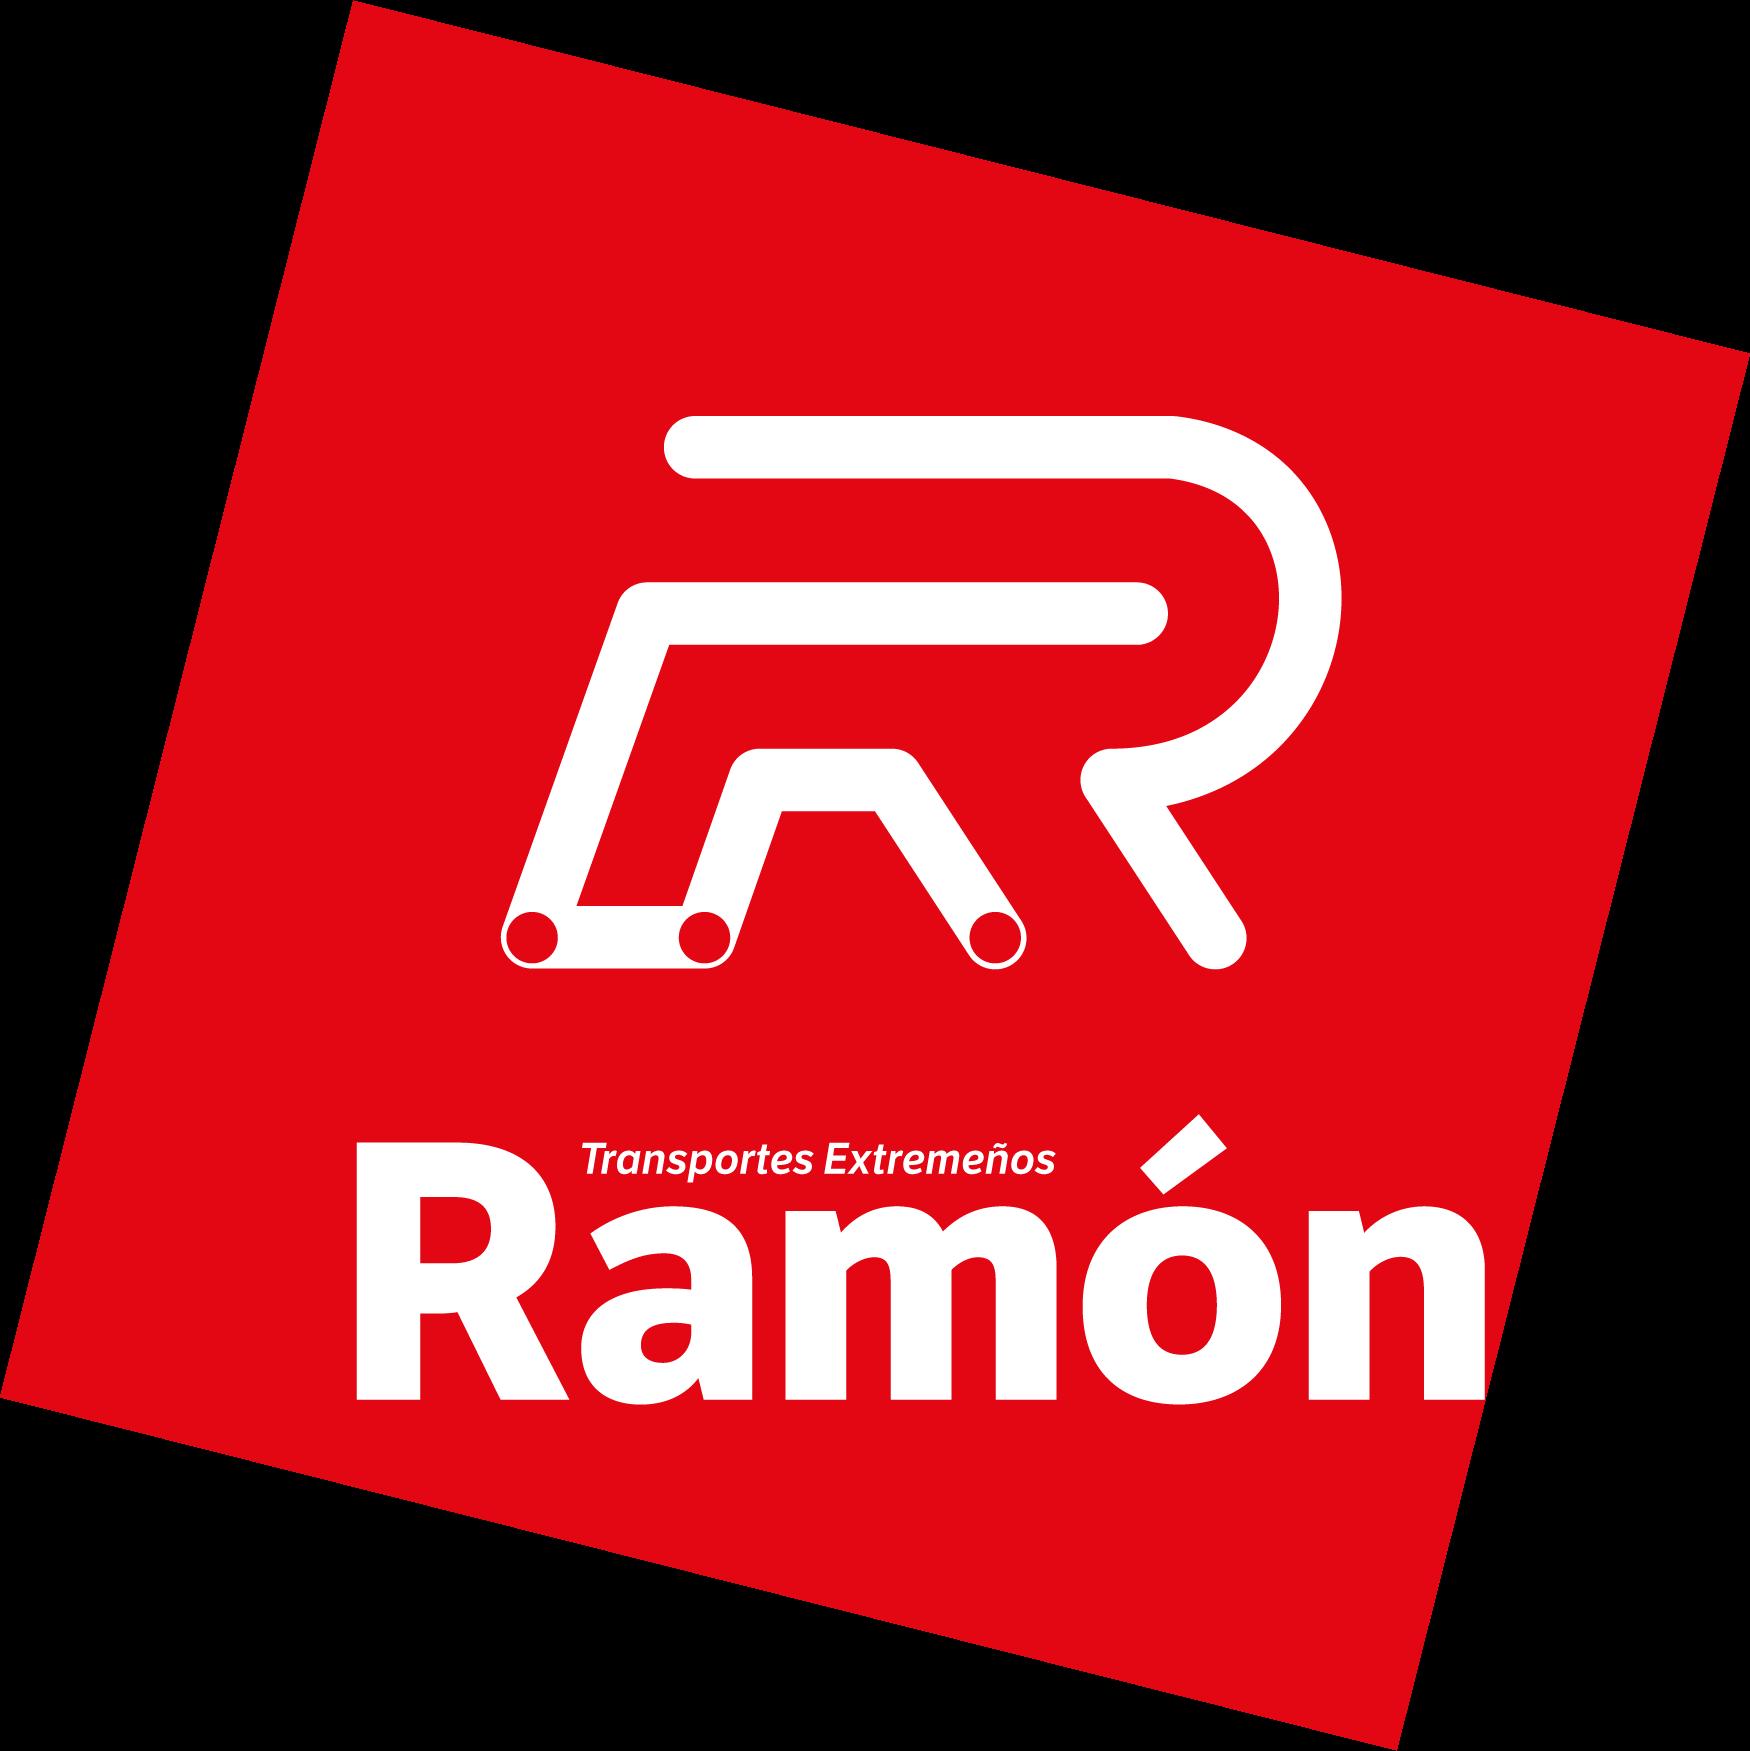 Transportes Extremeños Ramón